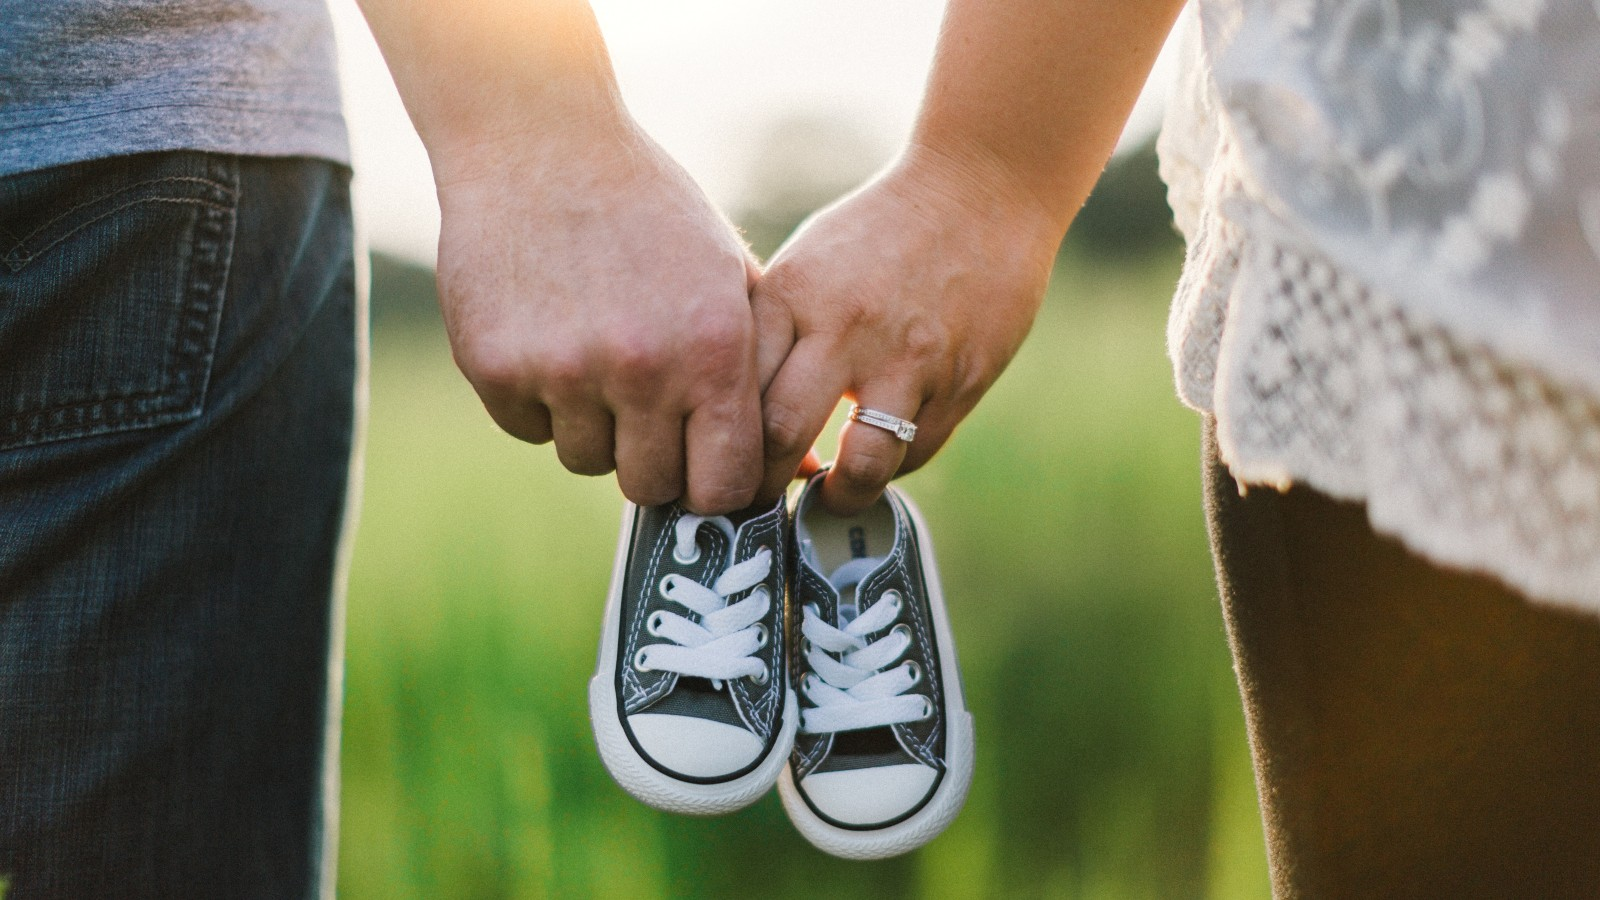 World's Largest Fertility Database Simplifies Surrogacy Journey